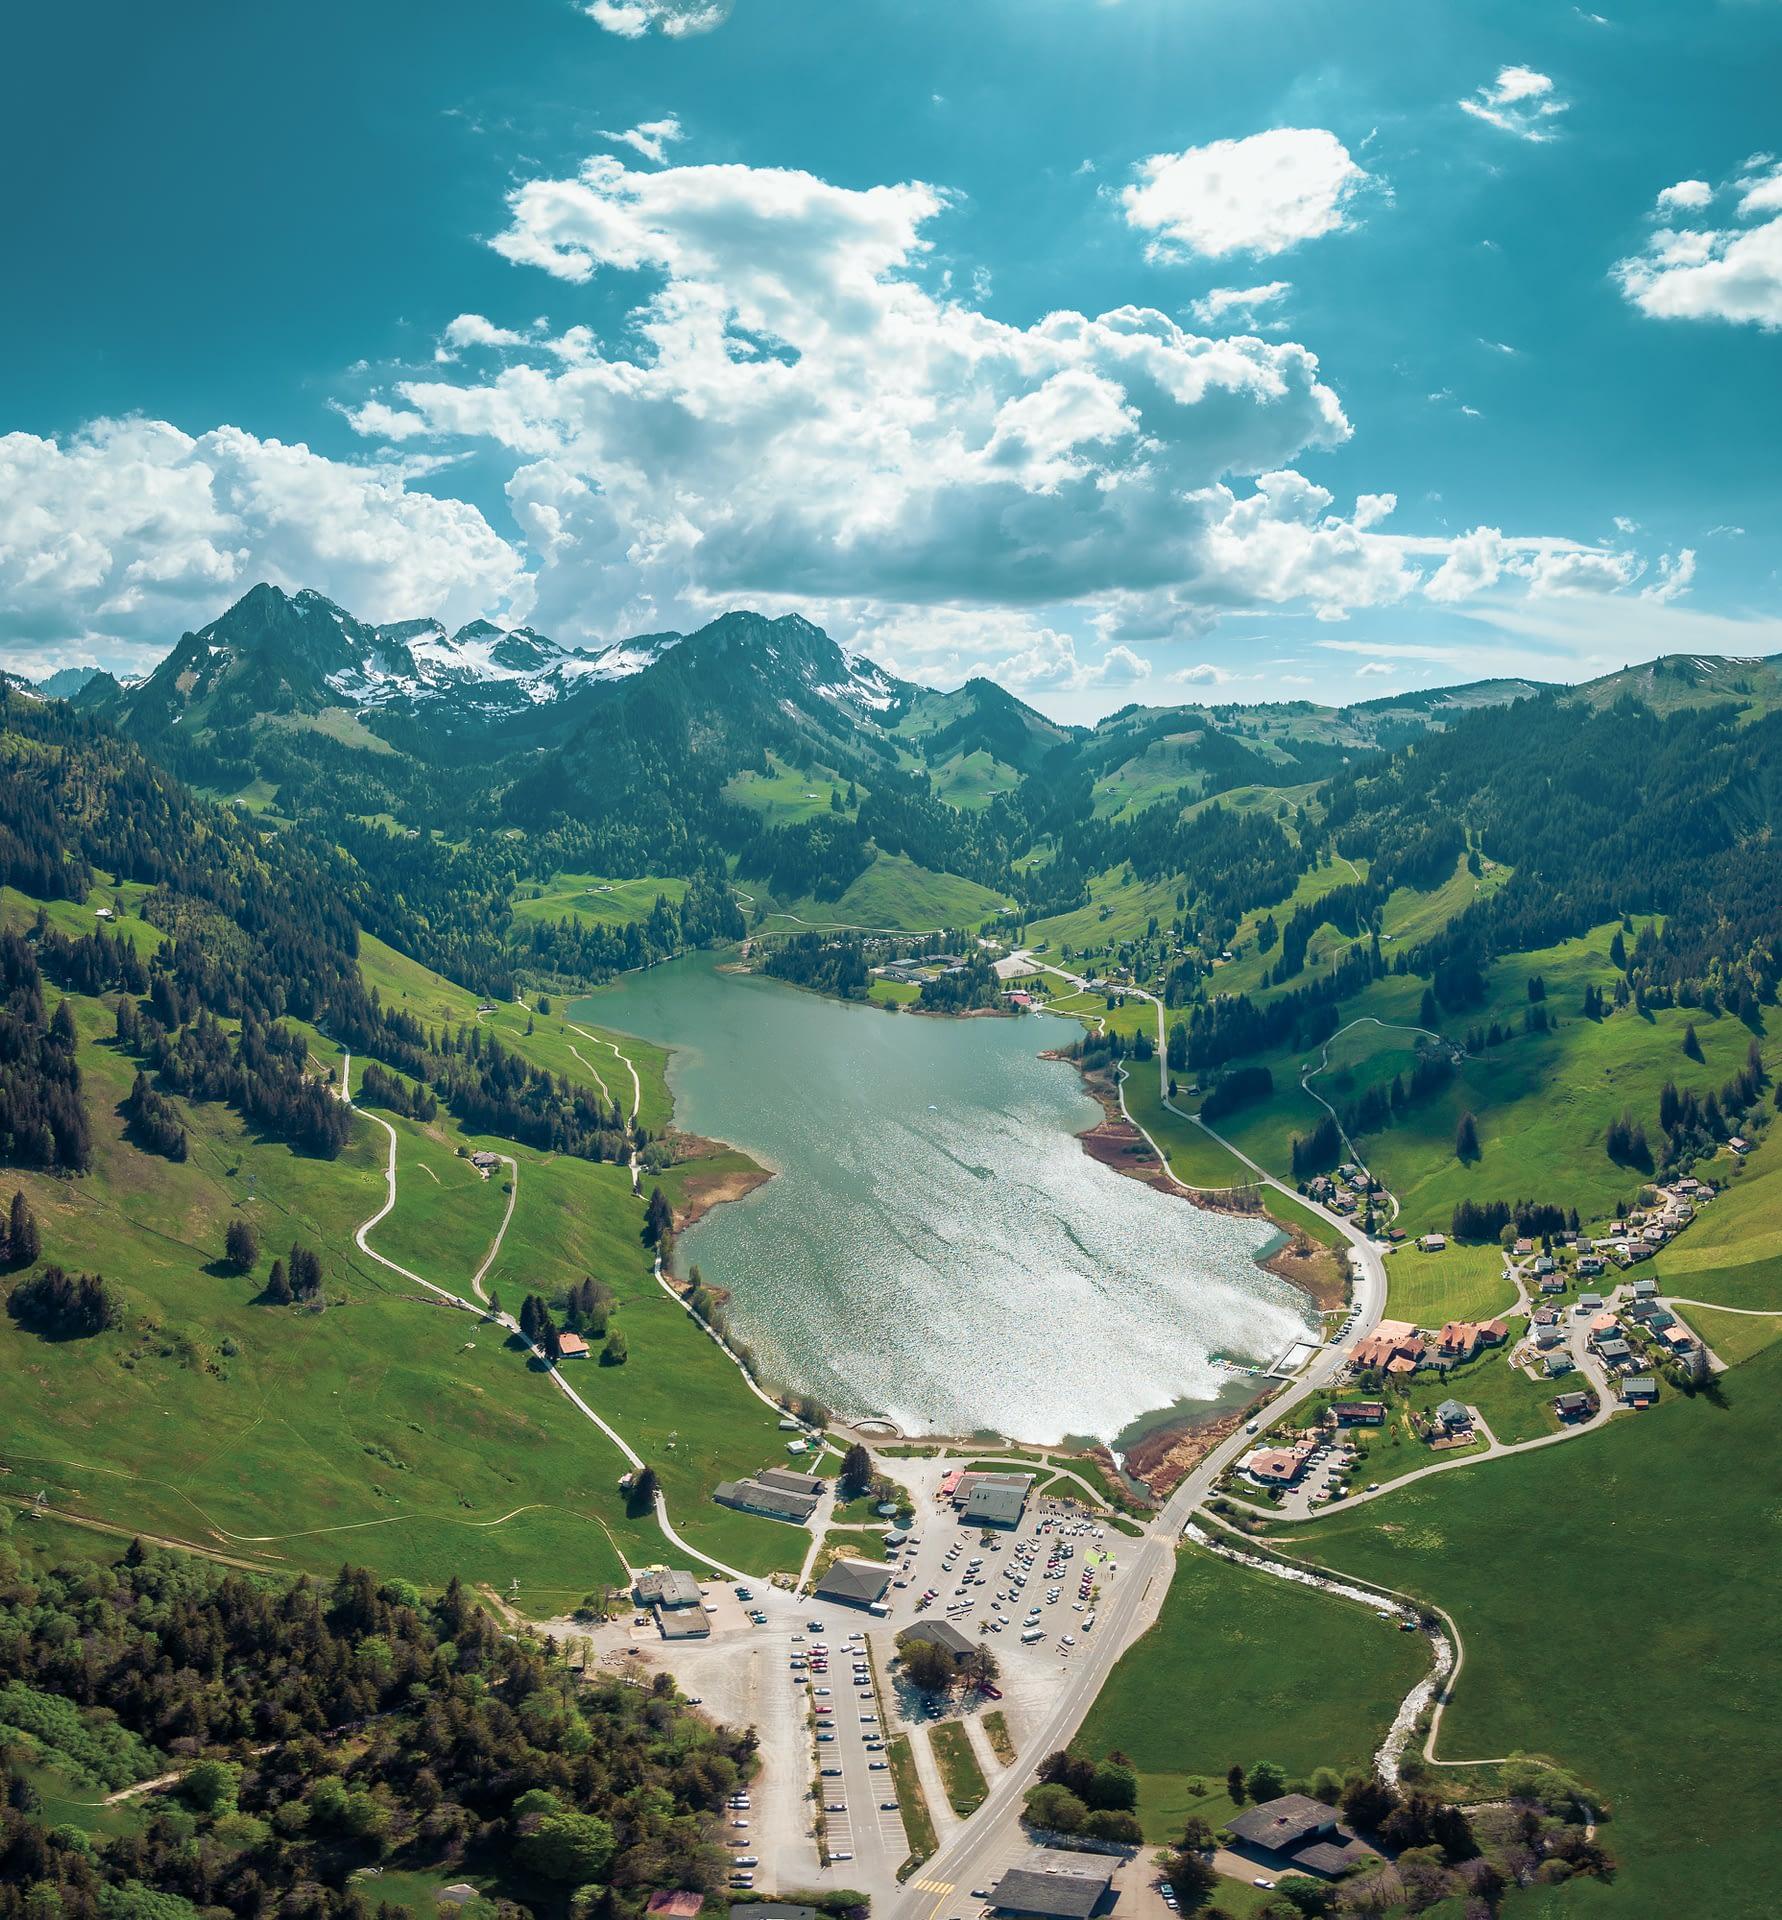 Schwarzsee Lac Noir Festival by STEMUTZ, 01.06.2021